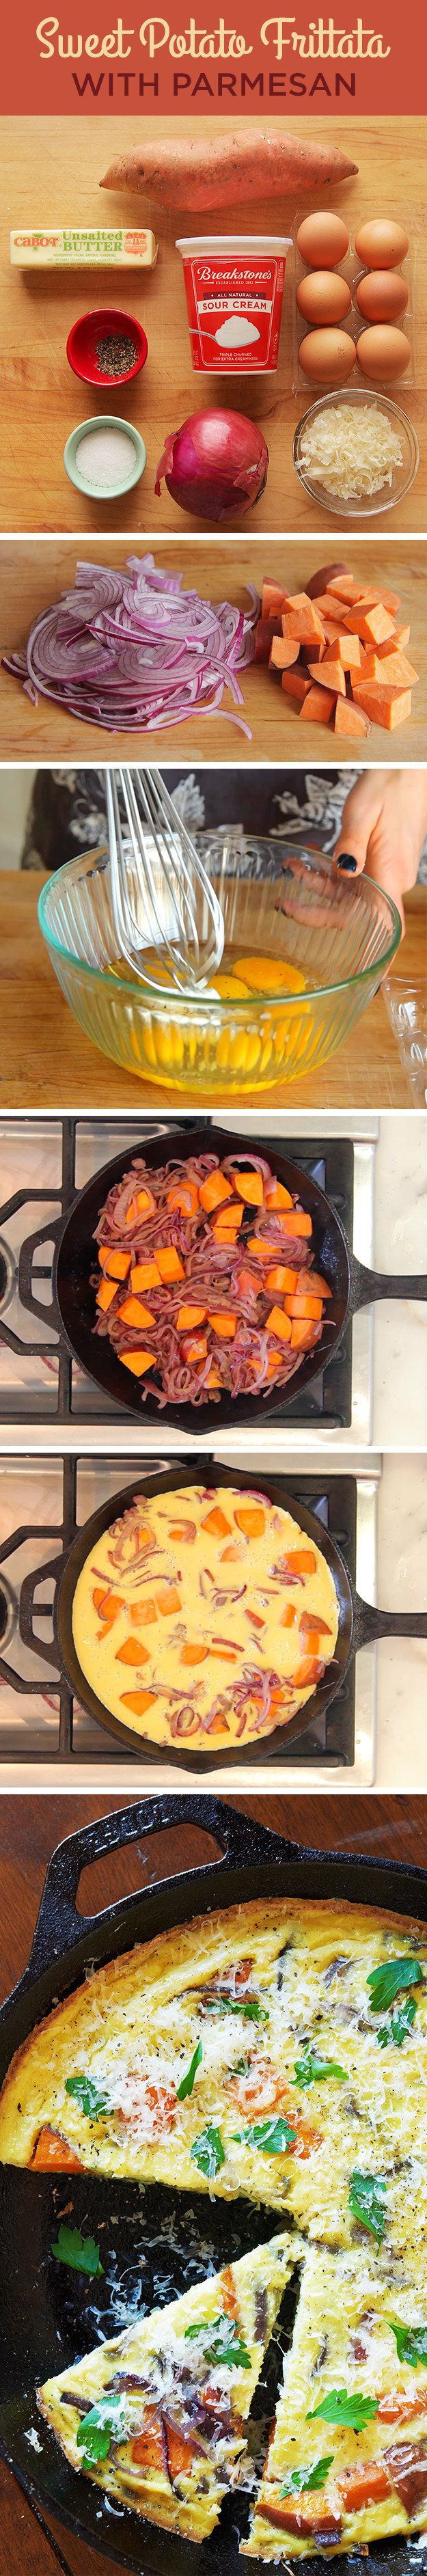 Skillet Sweet Potato Frittata with Parmesan